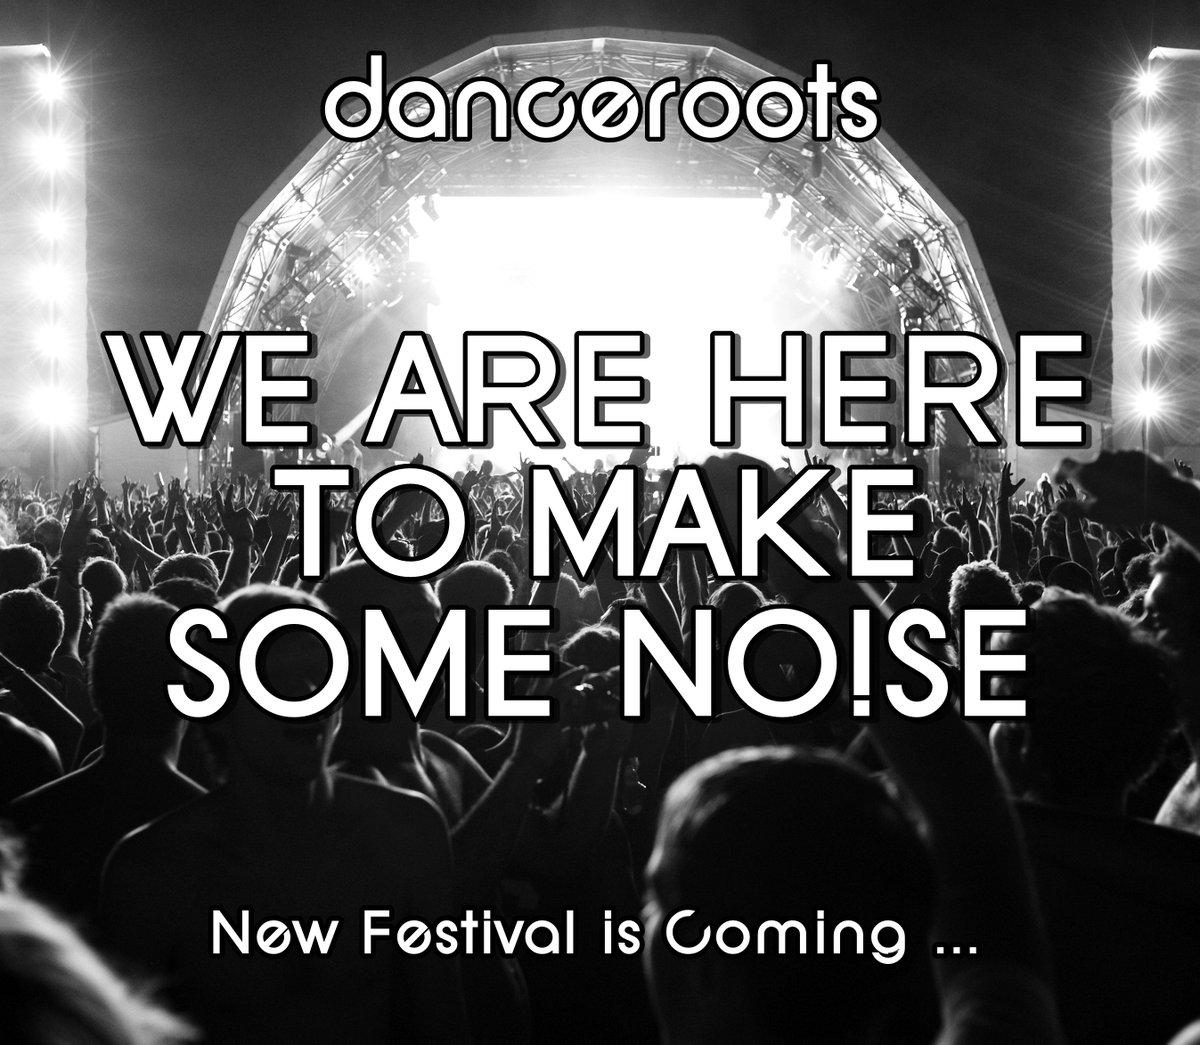 NEW FESTIVAL IS COMING ! #Durango  @DancerootsDjs / Coming Soon !  #festival #Djset #electronicmusic #Djlife #Techno #Trance #Hardstyle #HouseMusic #EDM #Dubstep #Dgo #MSN #LaNetaMeGusta #Soon<br>http://pic.twitter.com/yikq97JCiA